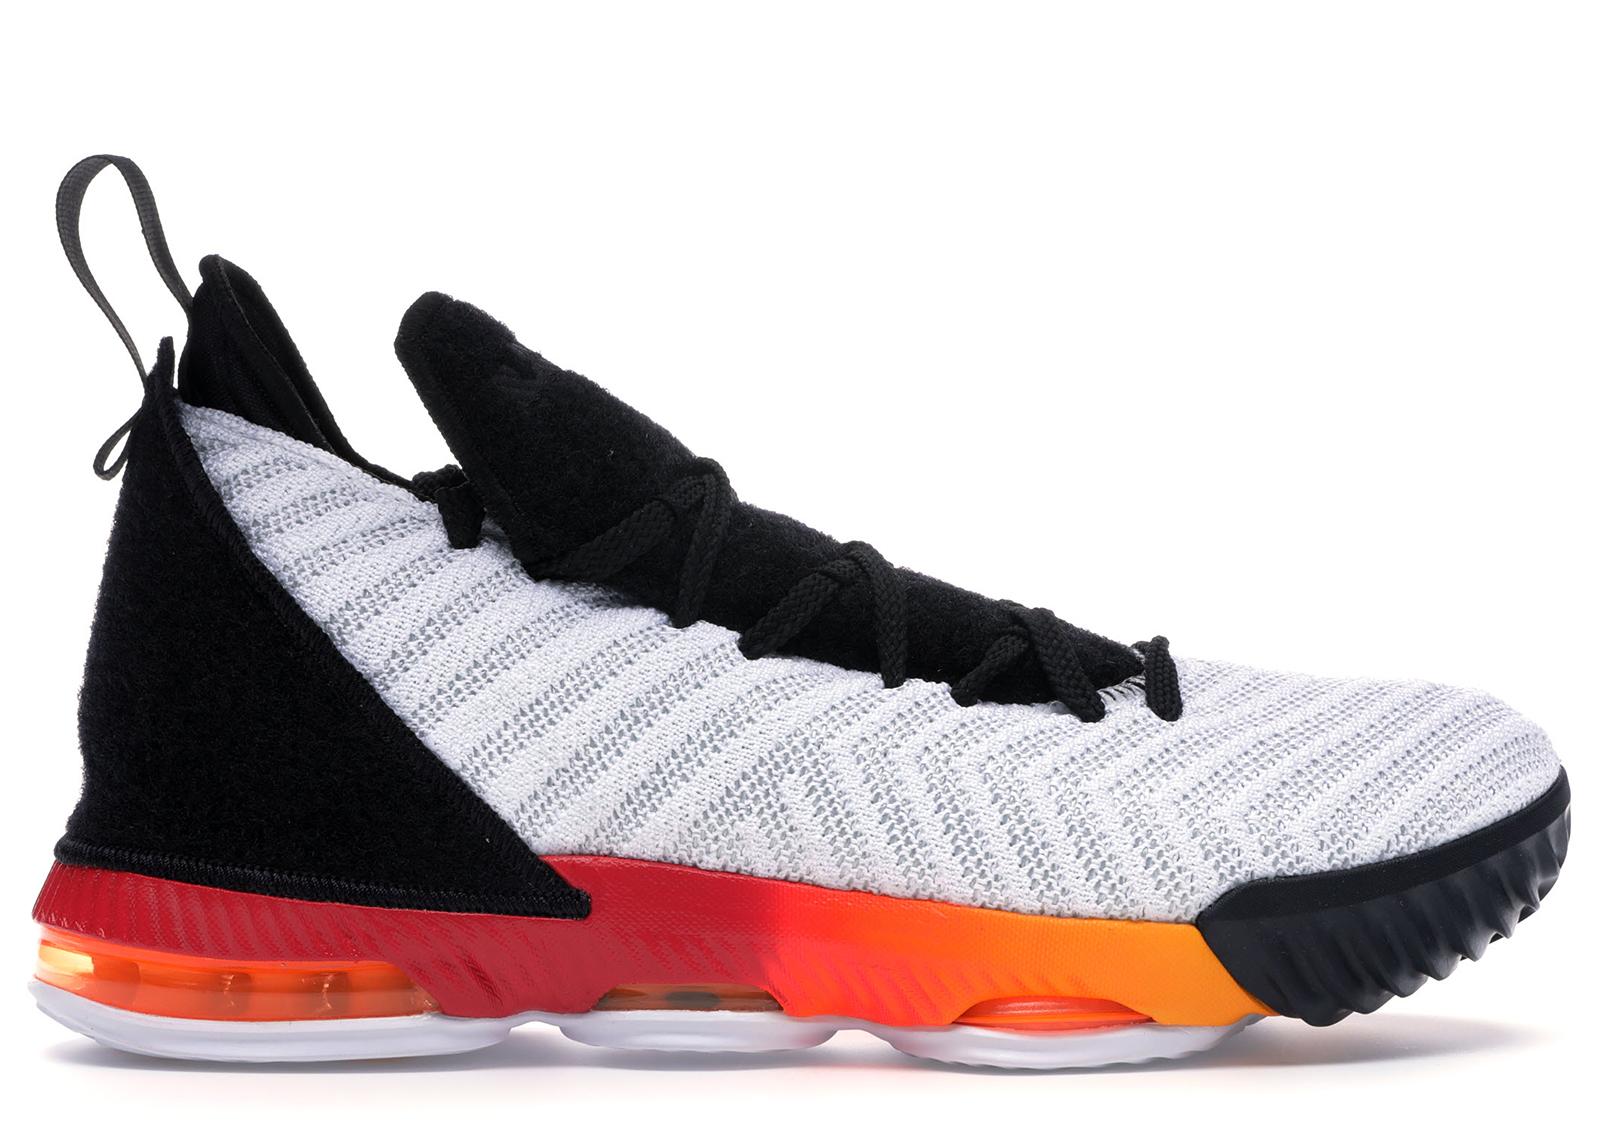 Nike LeBron 16 Strive (GS) - AQ2465-188